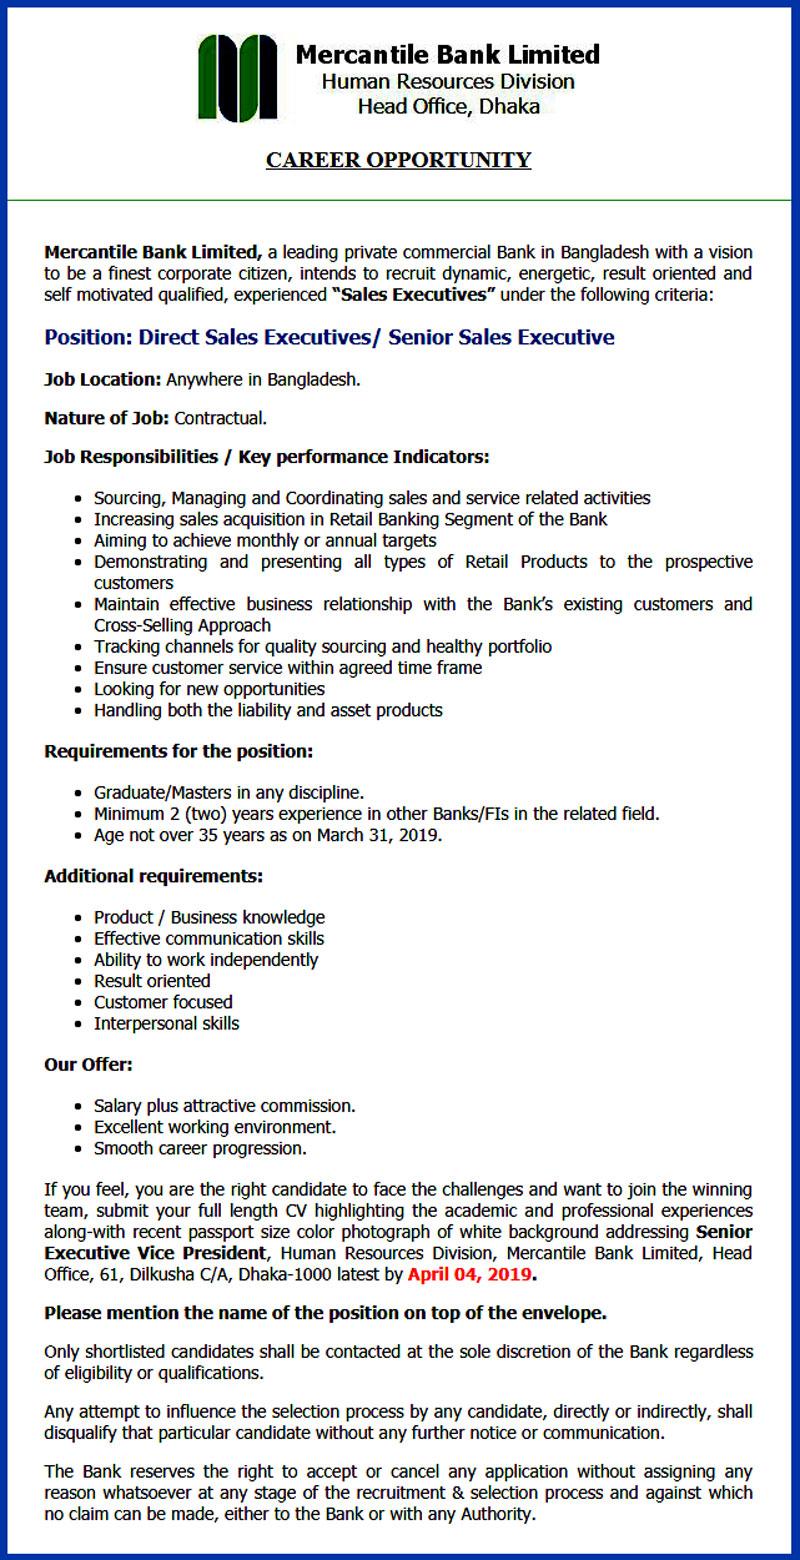 Mercantile Bank Ltd Job circular 2019 – www.mblbd.com